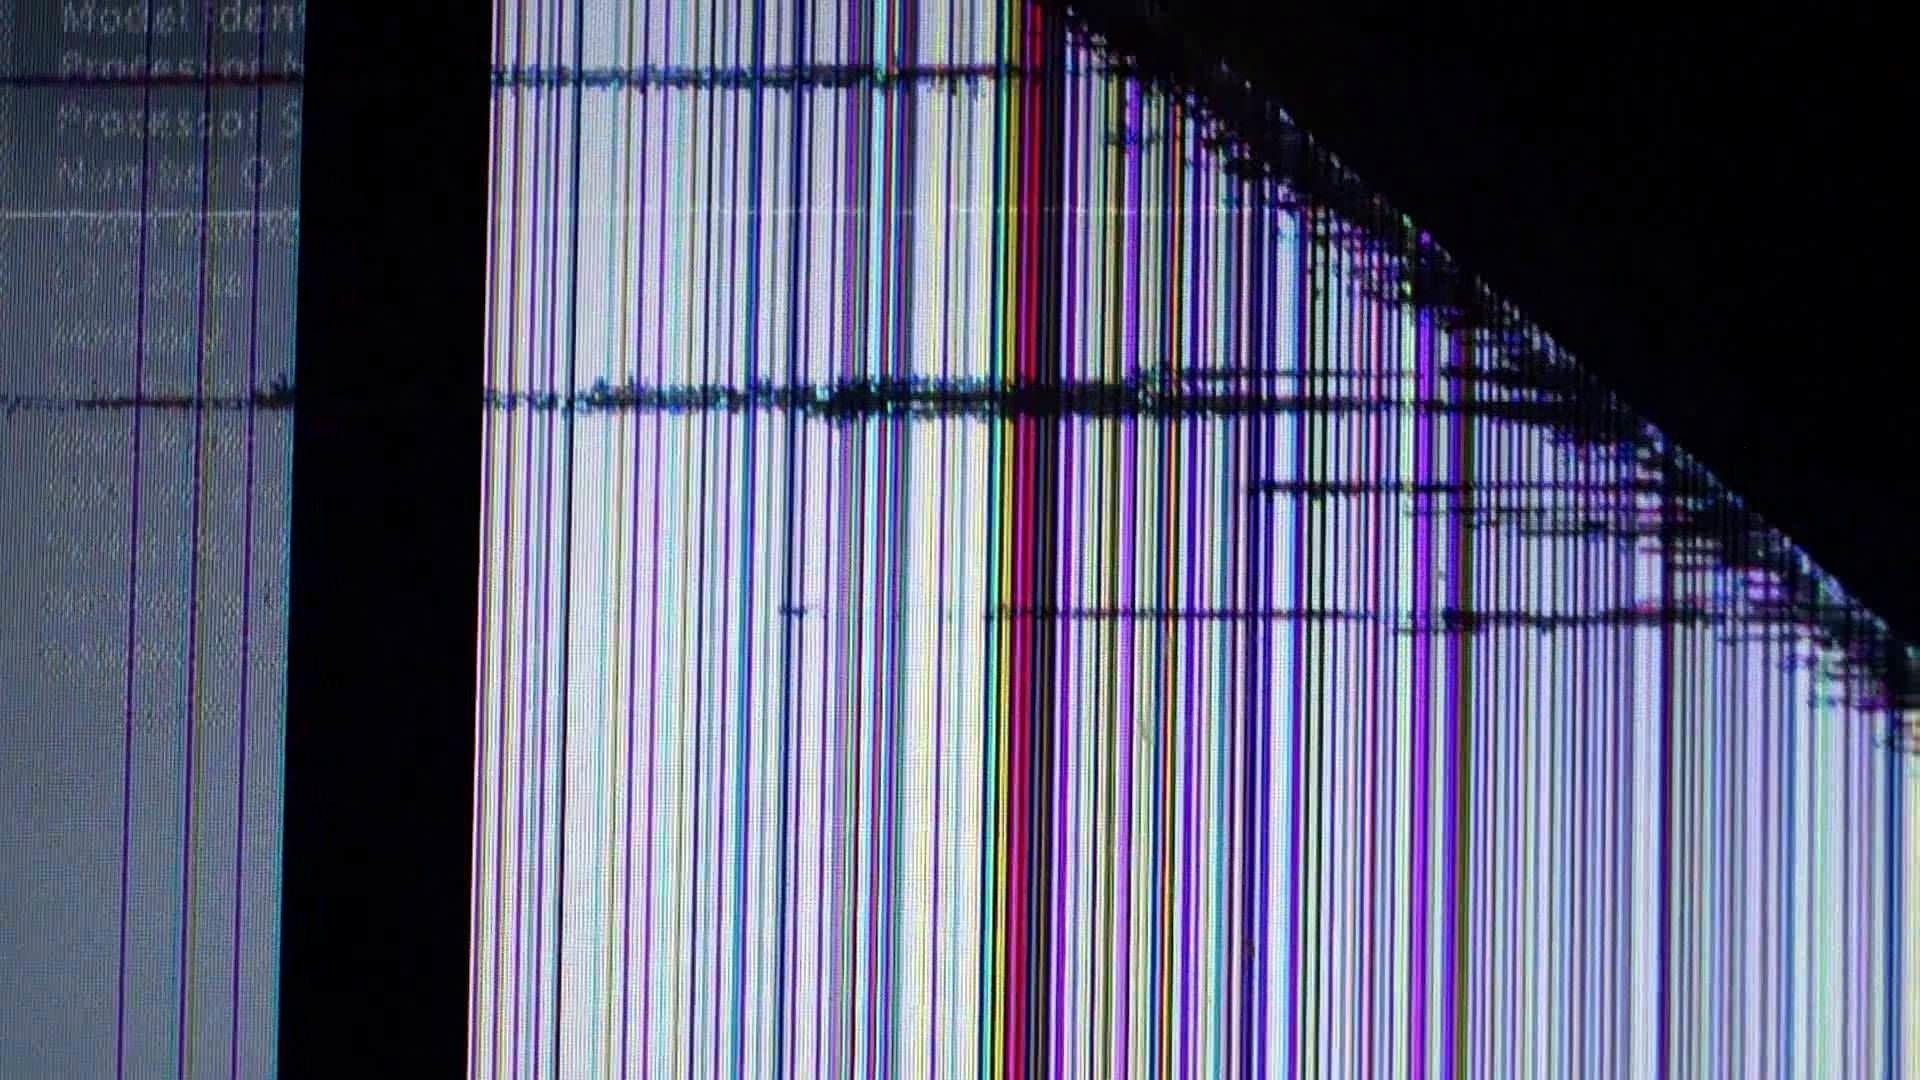 Inspirational How To Do The Broken Tv Screen Prank Broken Screen Wallpaper Broken Screen Phone Screen Wallpaper